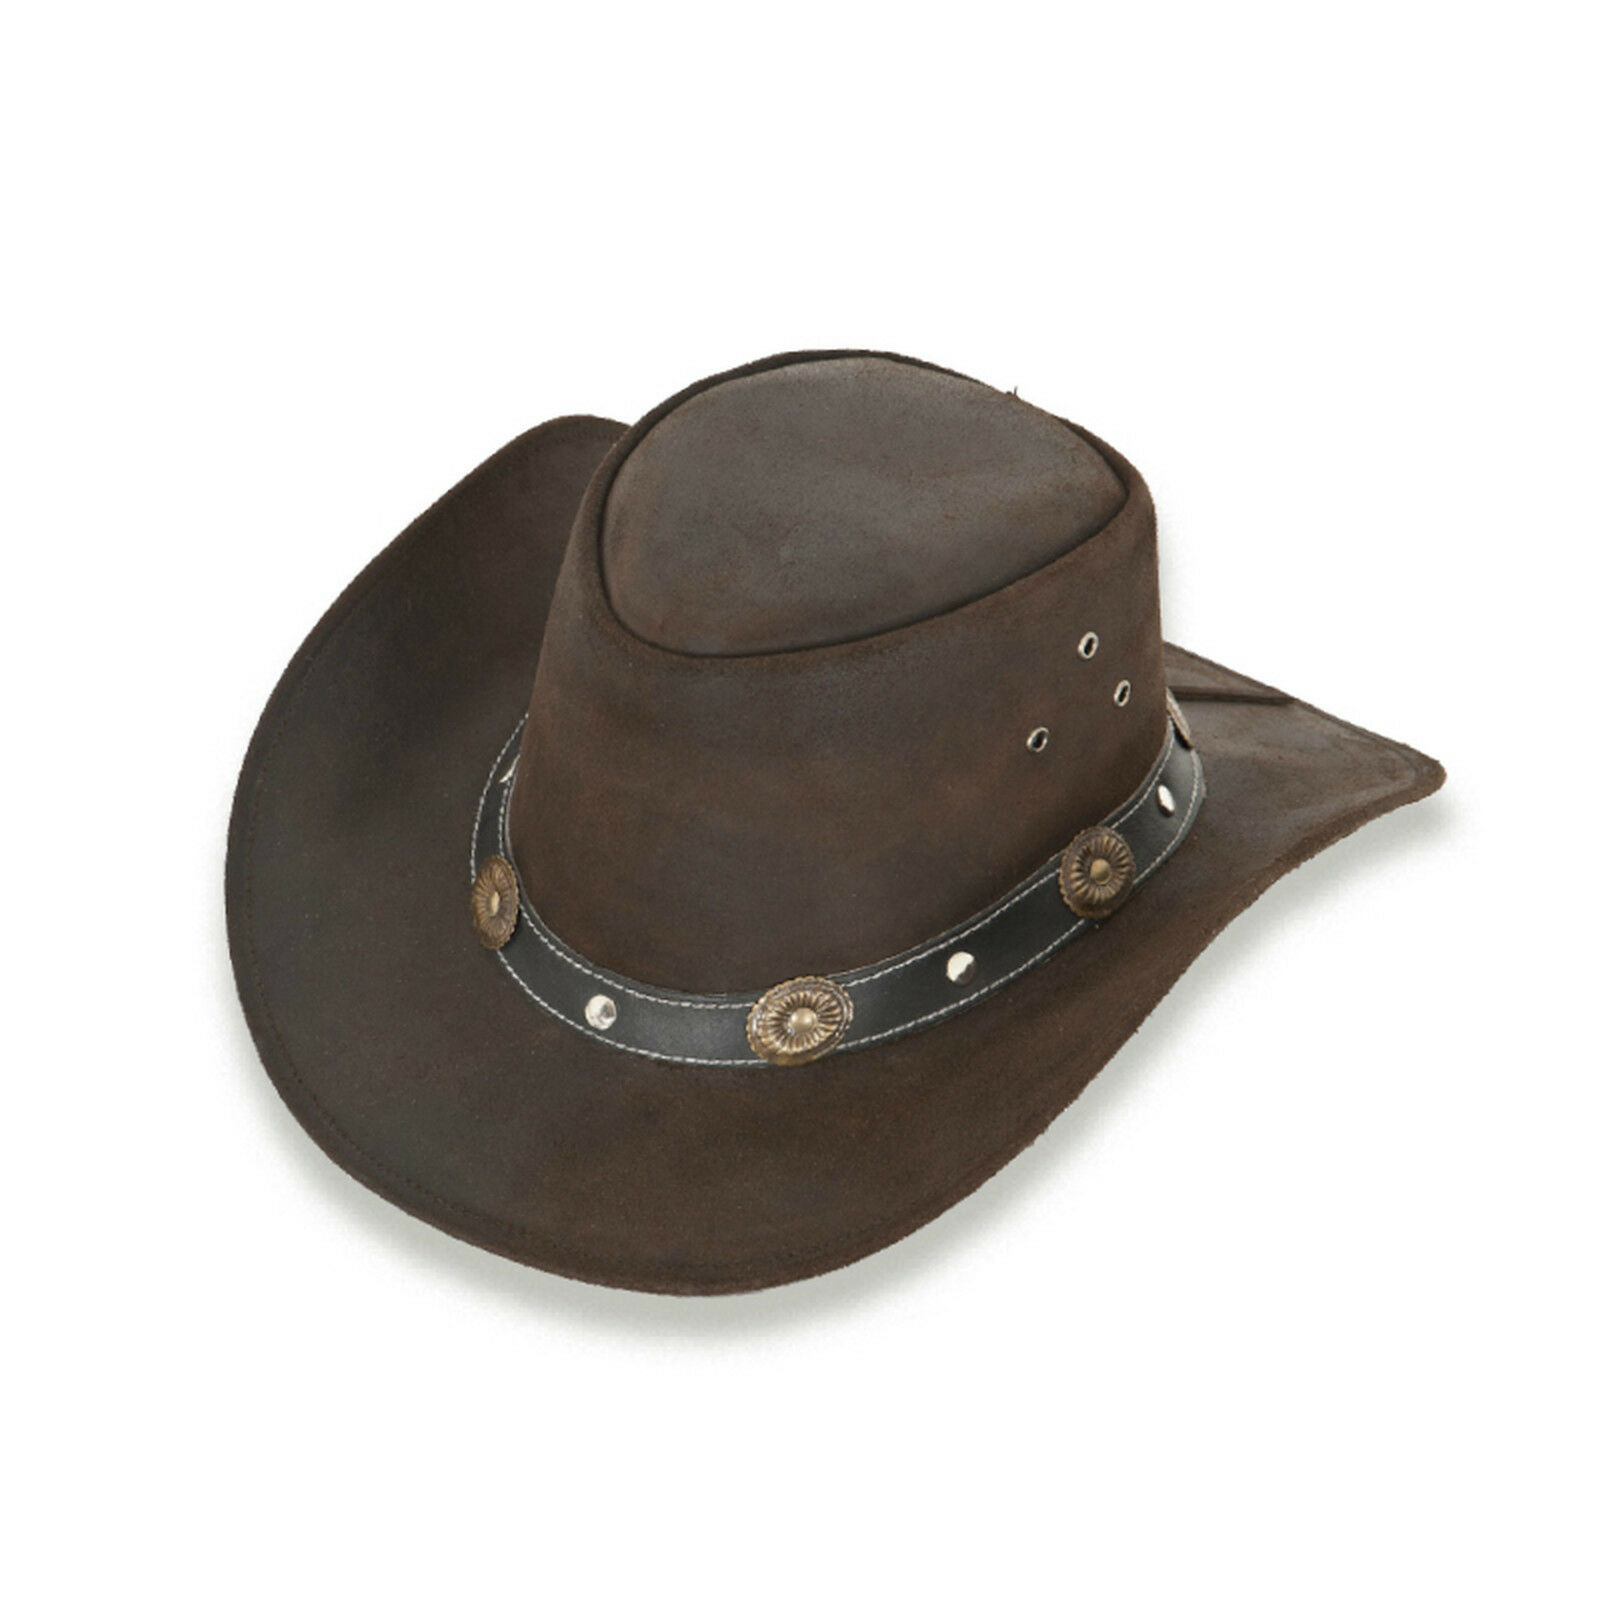 LODENHUT  RENO Australien Leather Hat Lederhut Cowboyhut Westernhut Country Hut